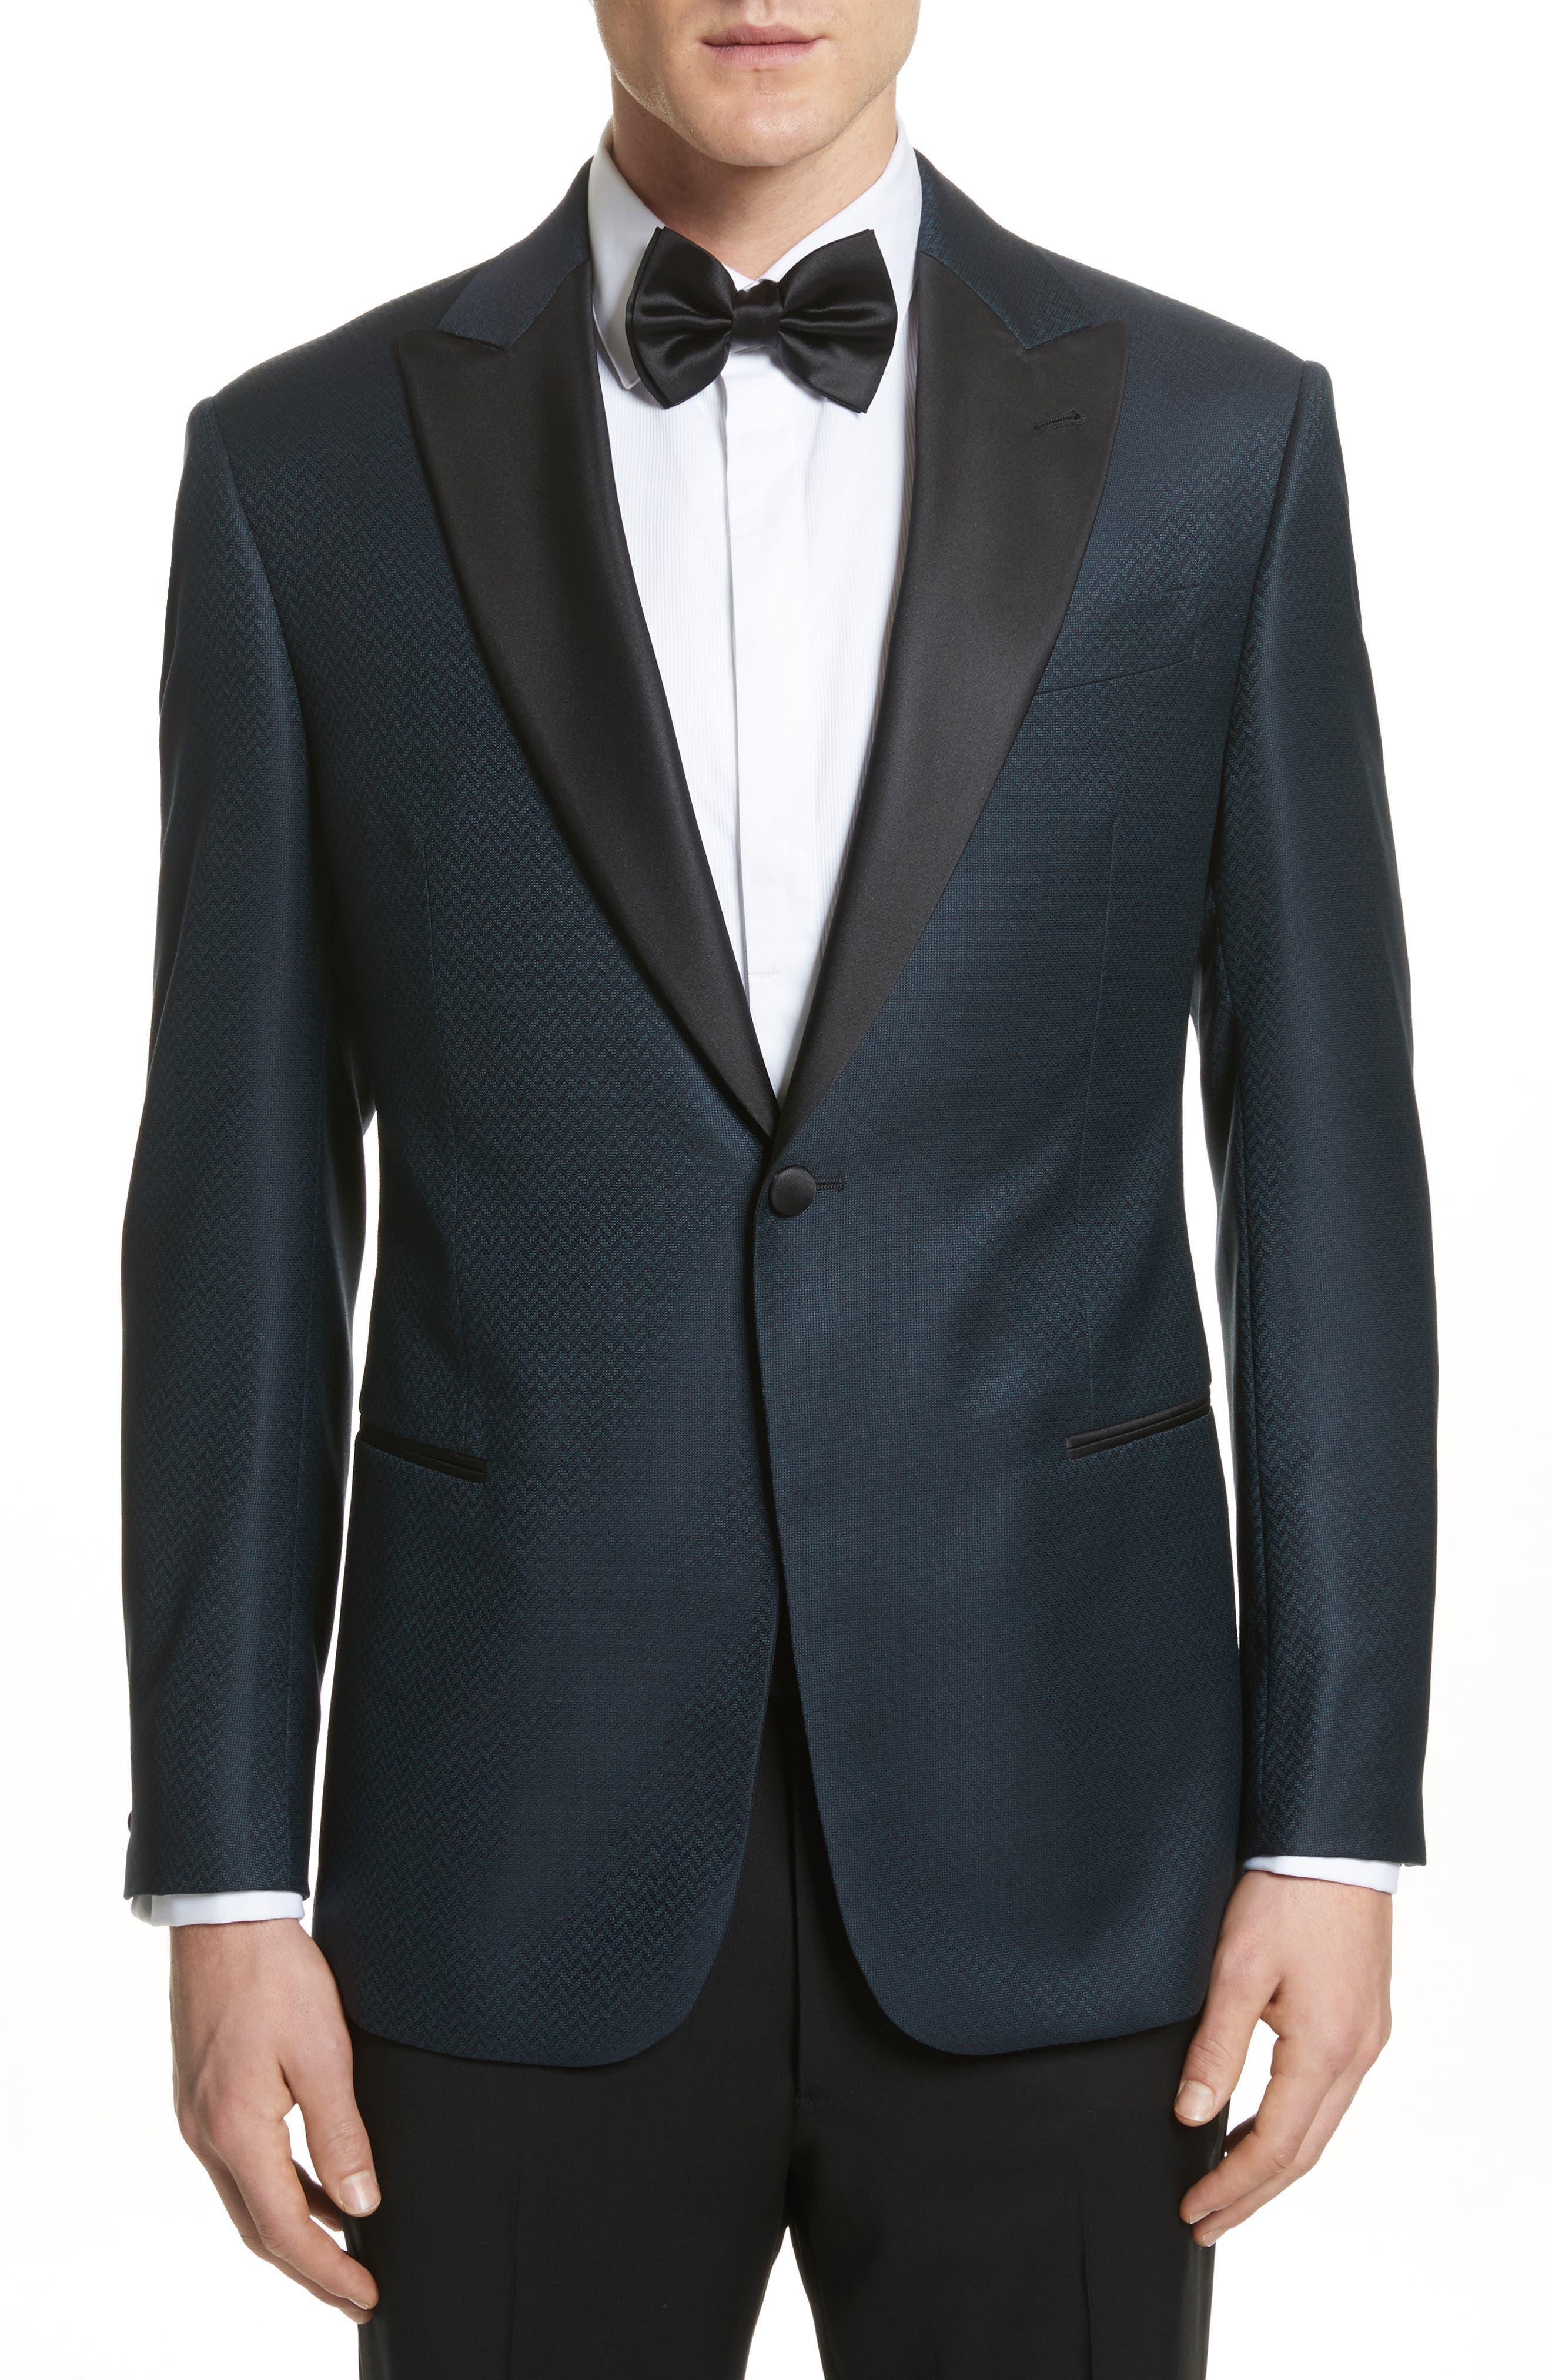 G-Line Trim Fit Wool Dinner Jacket,                             Main thumbnail 1, color,                             Blue